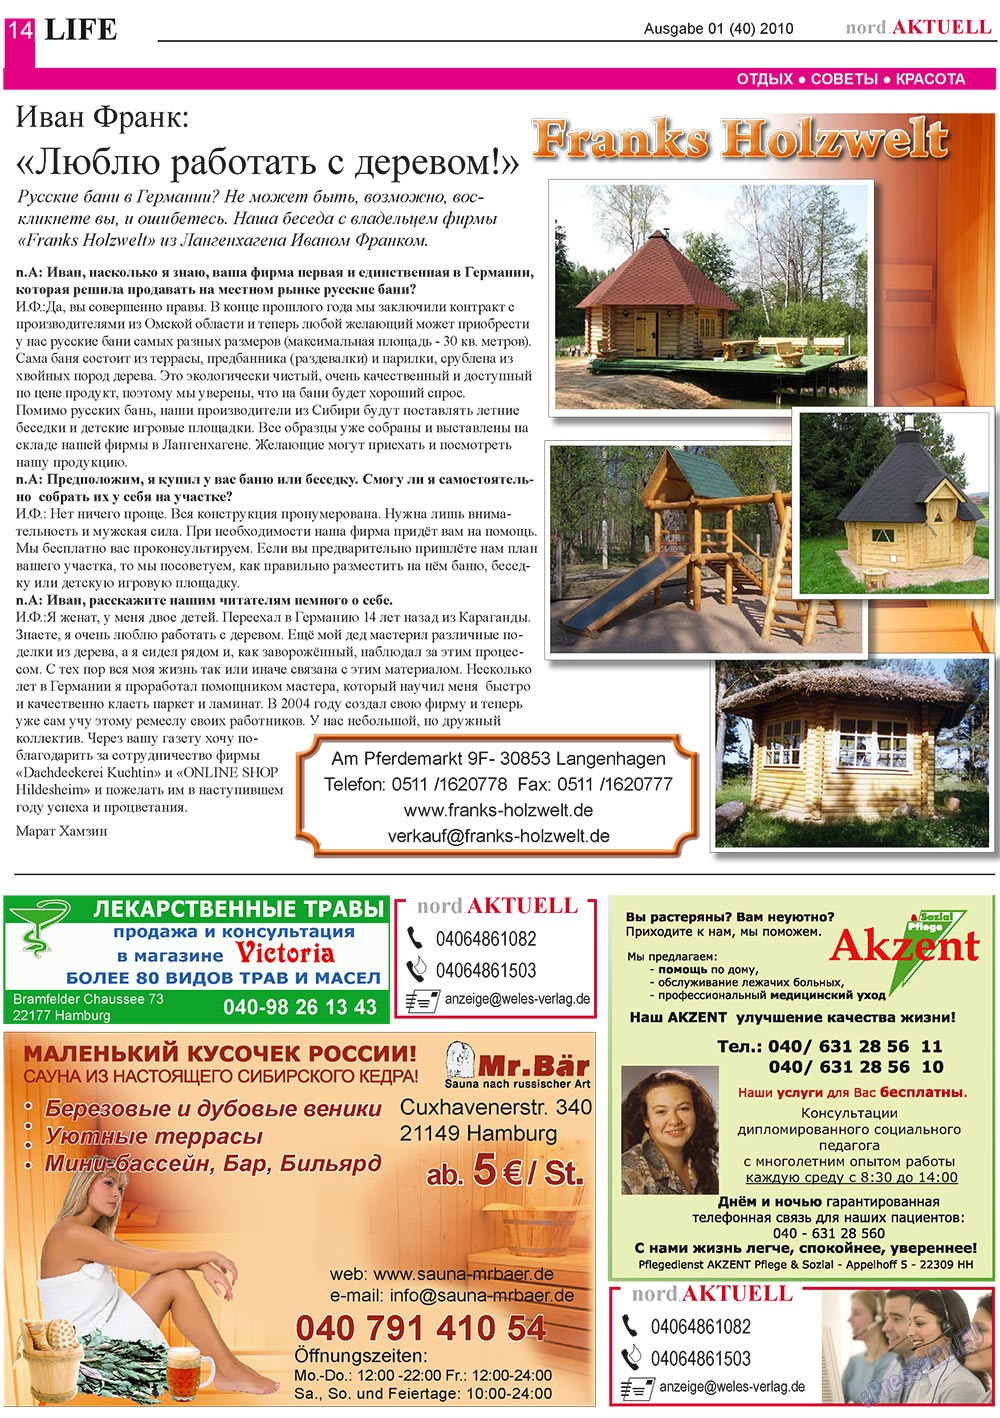 nord.Aktuell (газета). 2010 год, номер 1, стр. 14